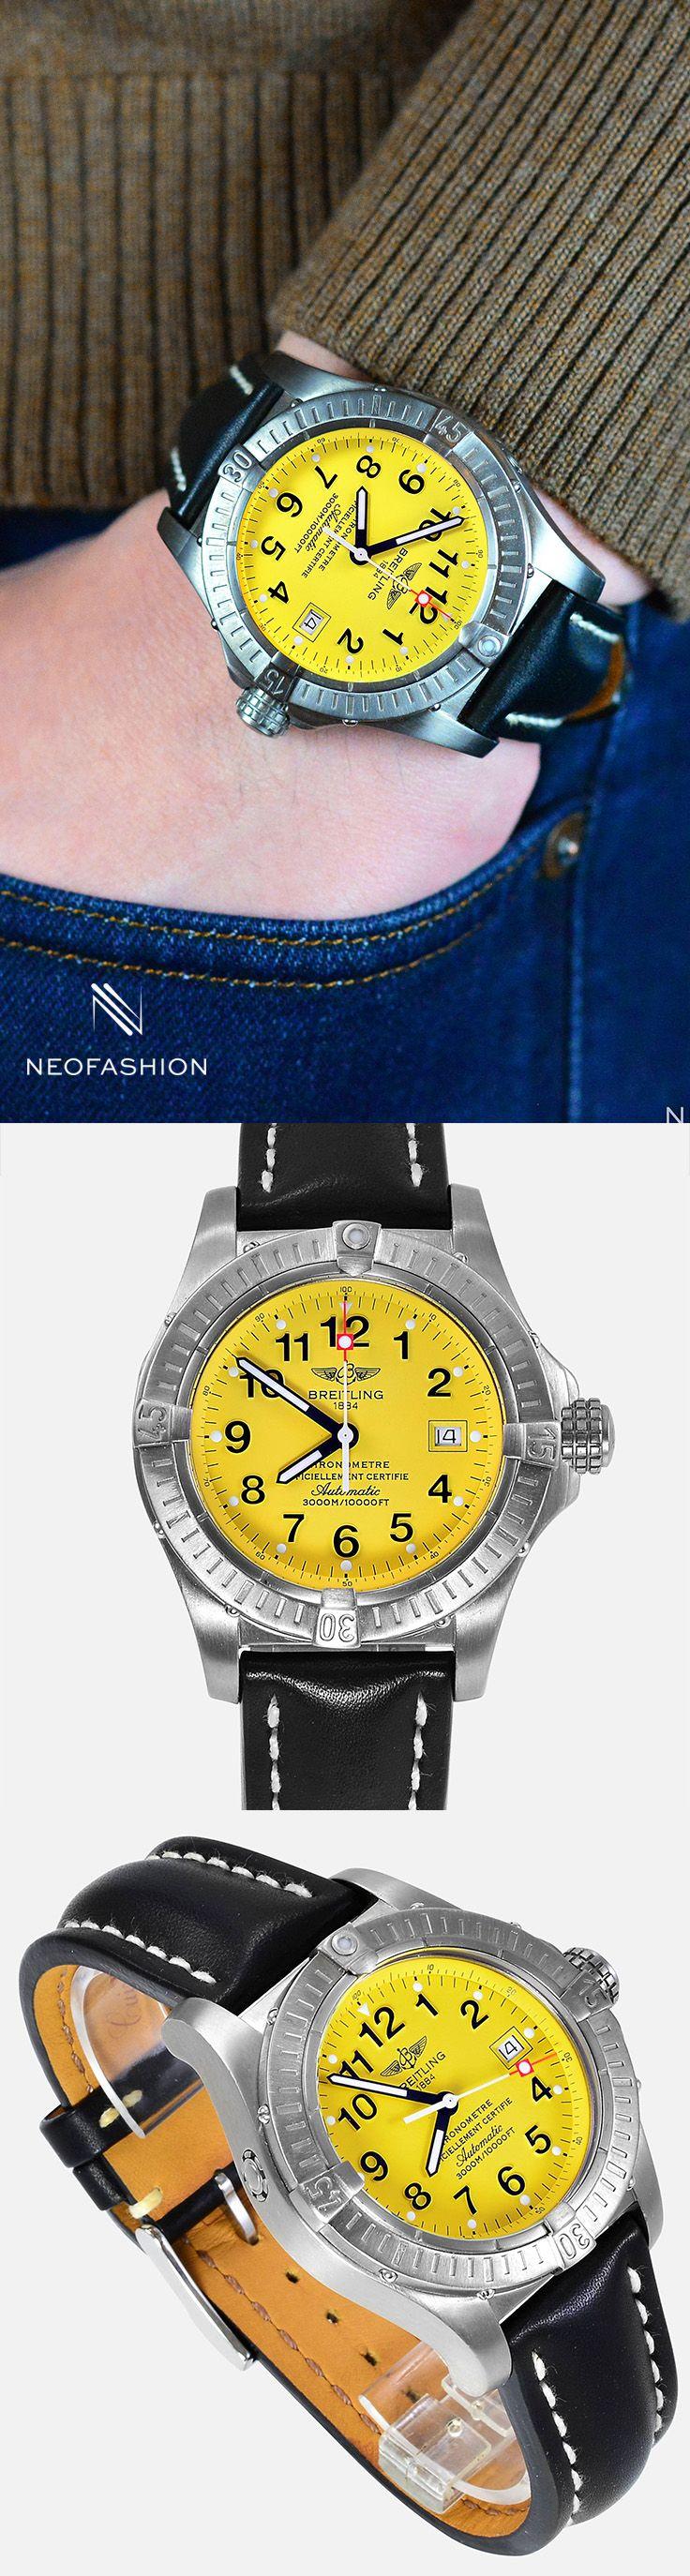 Breitling Seawolf Avenger Titanium Yellow Dial E17370  #Breitling